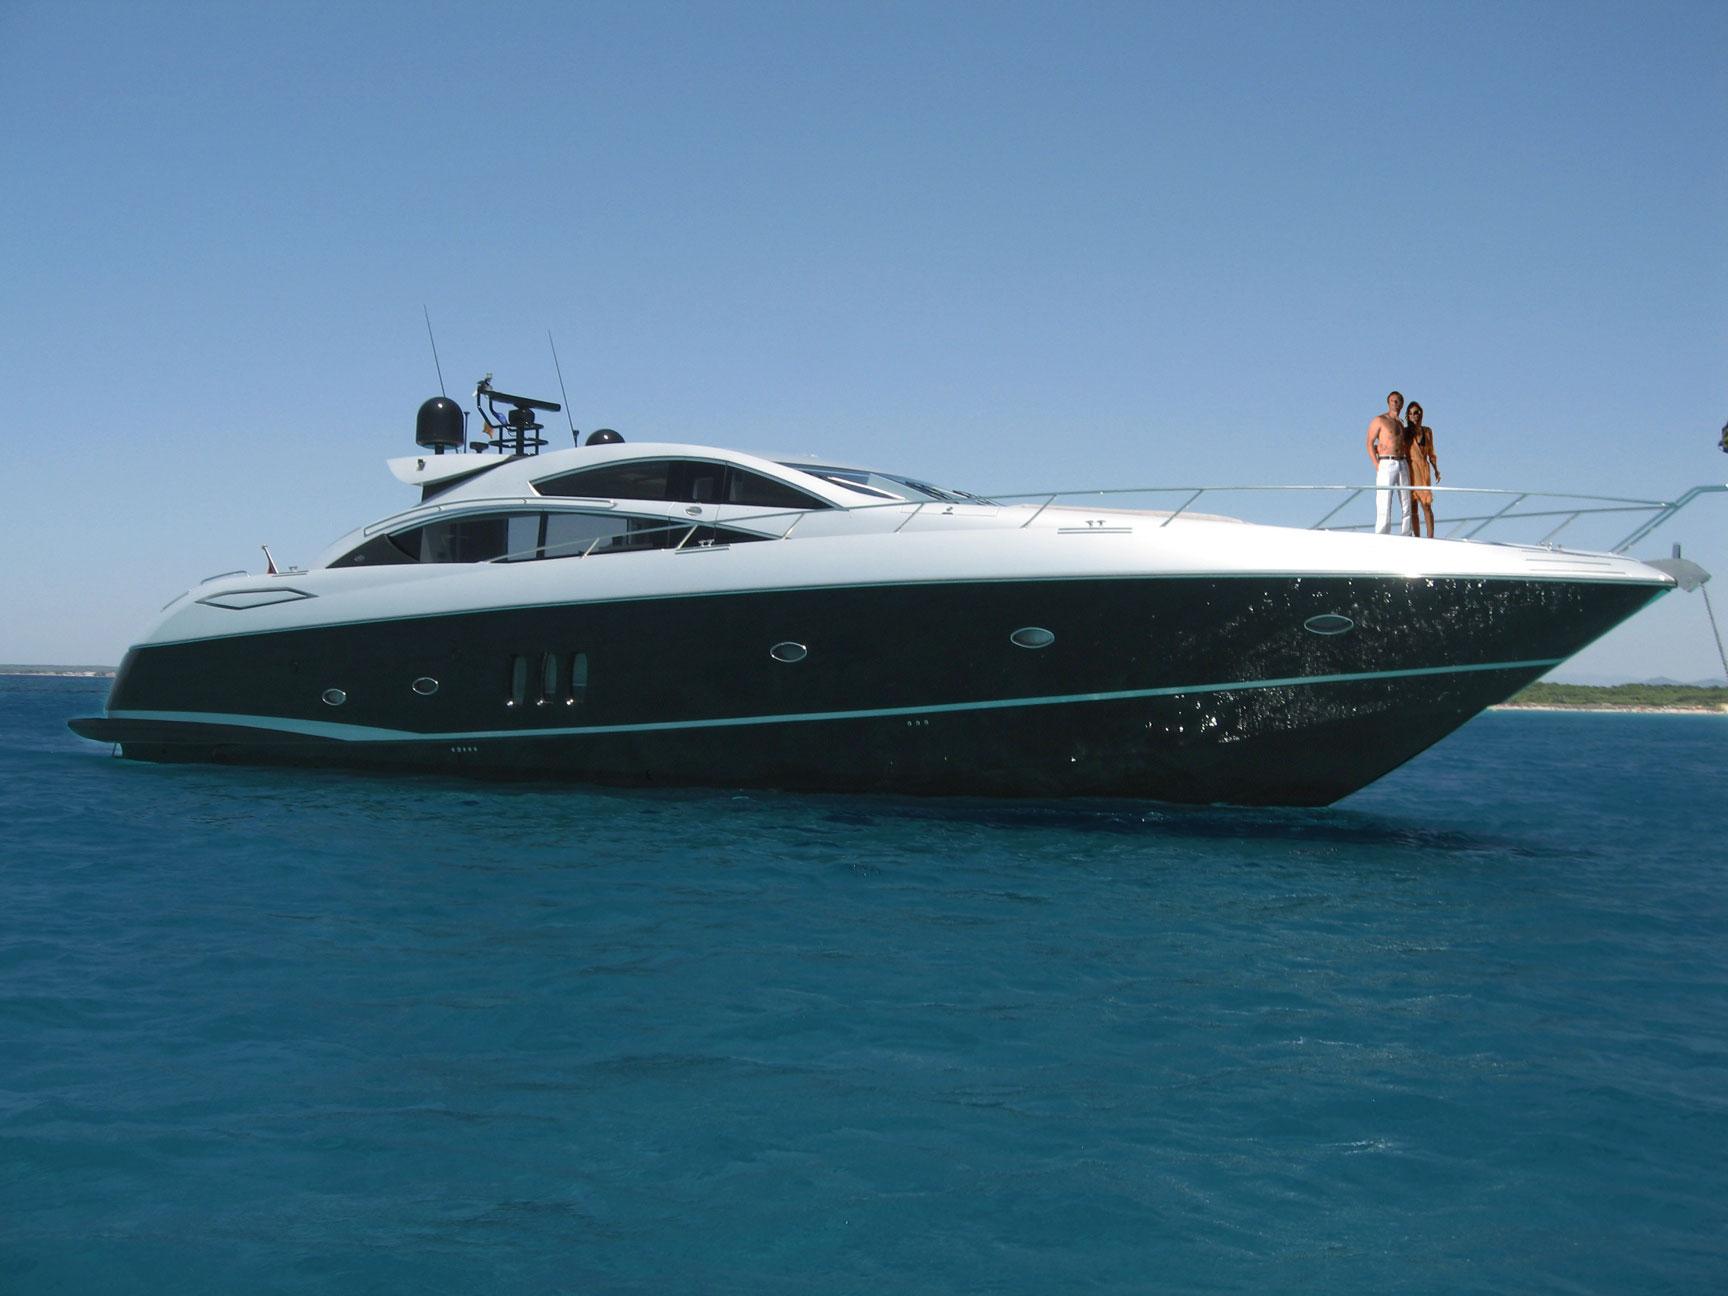 Clarity Yacht Charter Sunseeker Predator 82  : sunseeker predator 82 anchor from www.clarityyachts.com size 1728 x 1296 jpeg 185kB